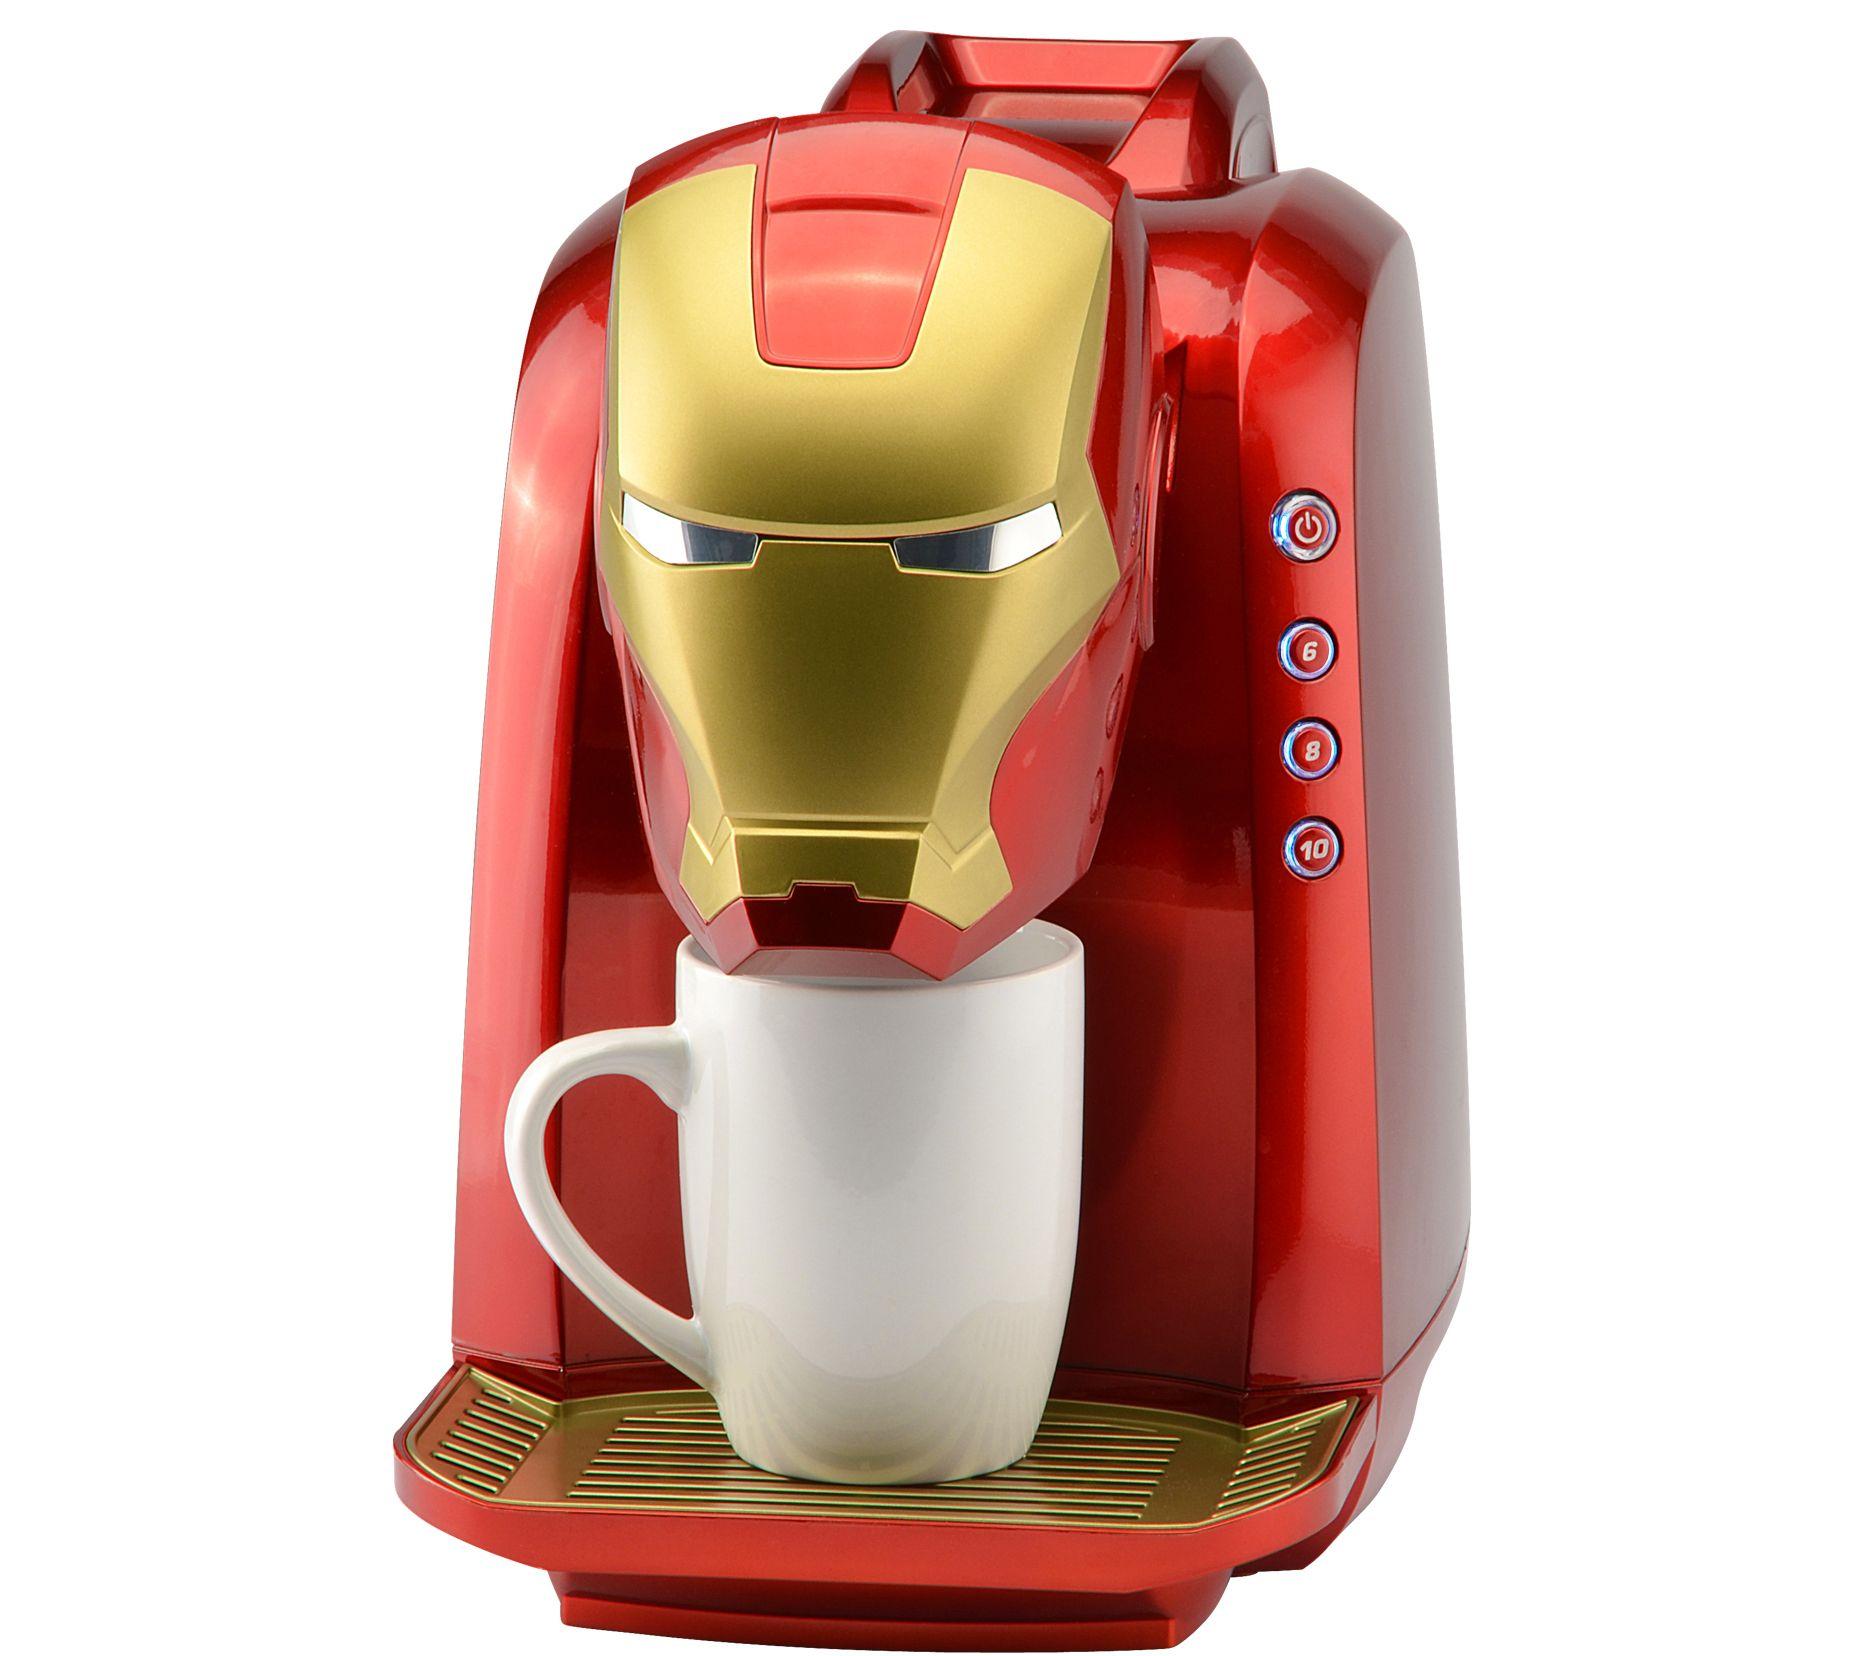 f3b891d3840be Marvel Iron Man Single-Serve Coffee Maker — QVC.com